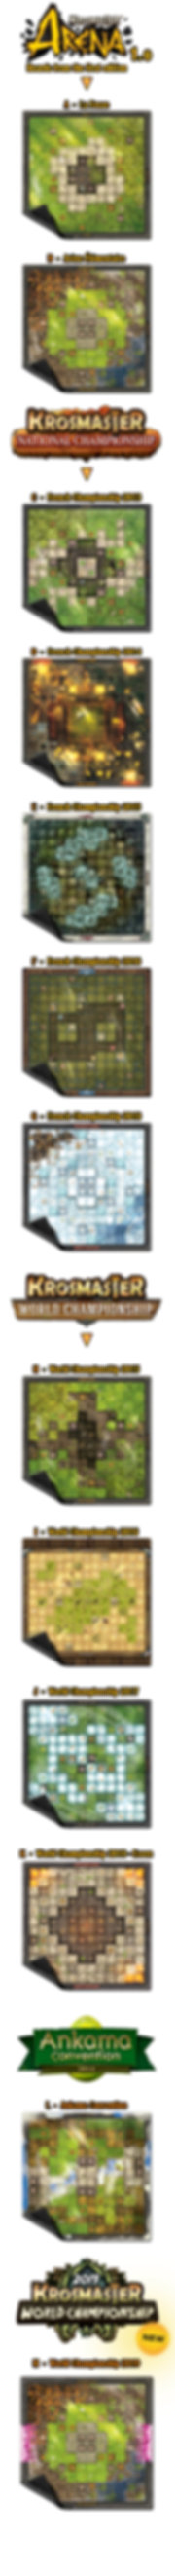 Krosmaster Playmats by Wogamat - the Com